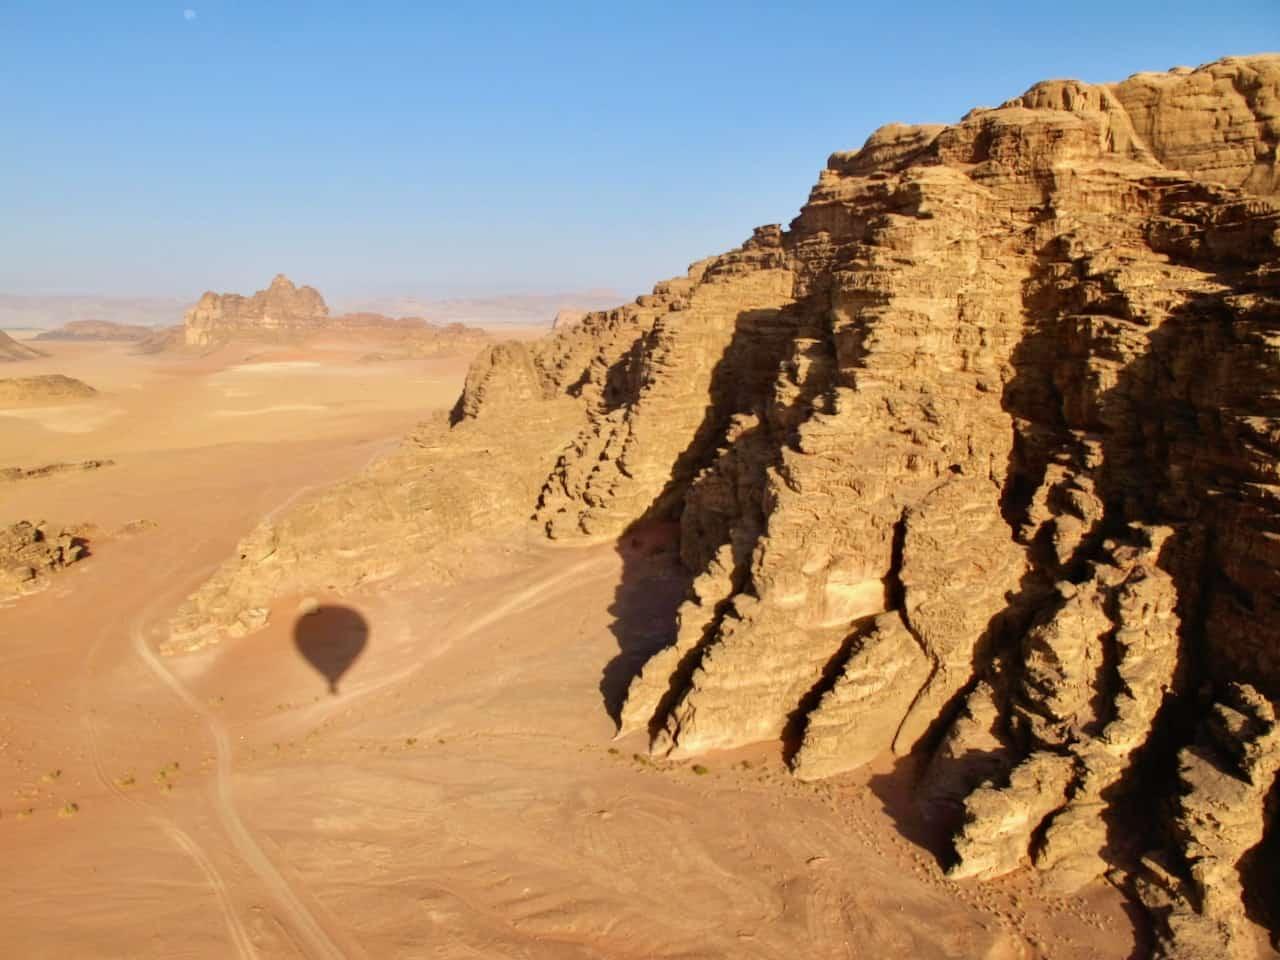 Hot-air balloon flight over Wadi Rum